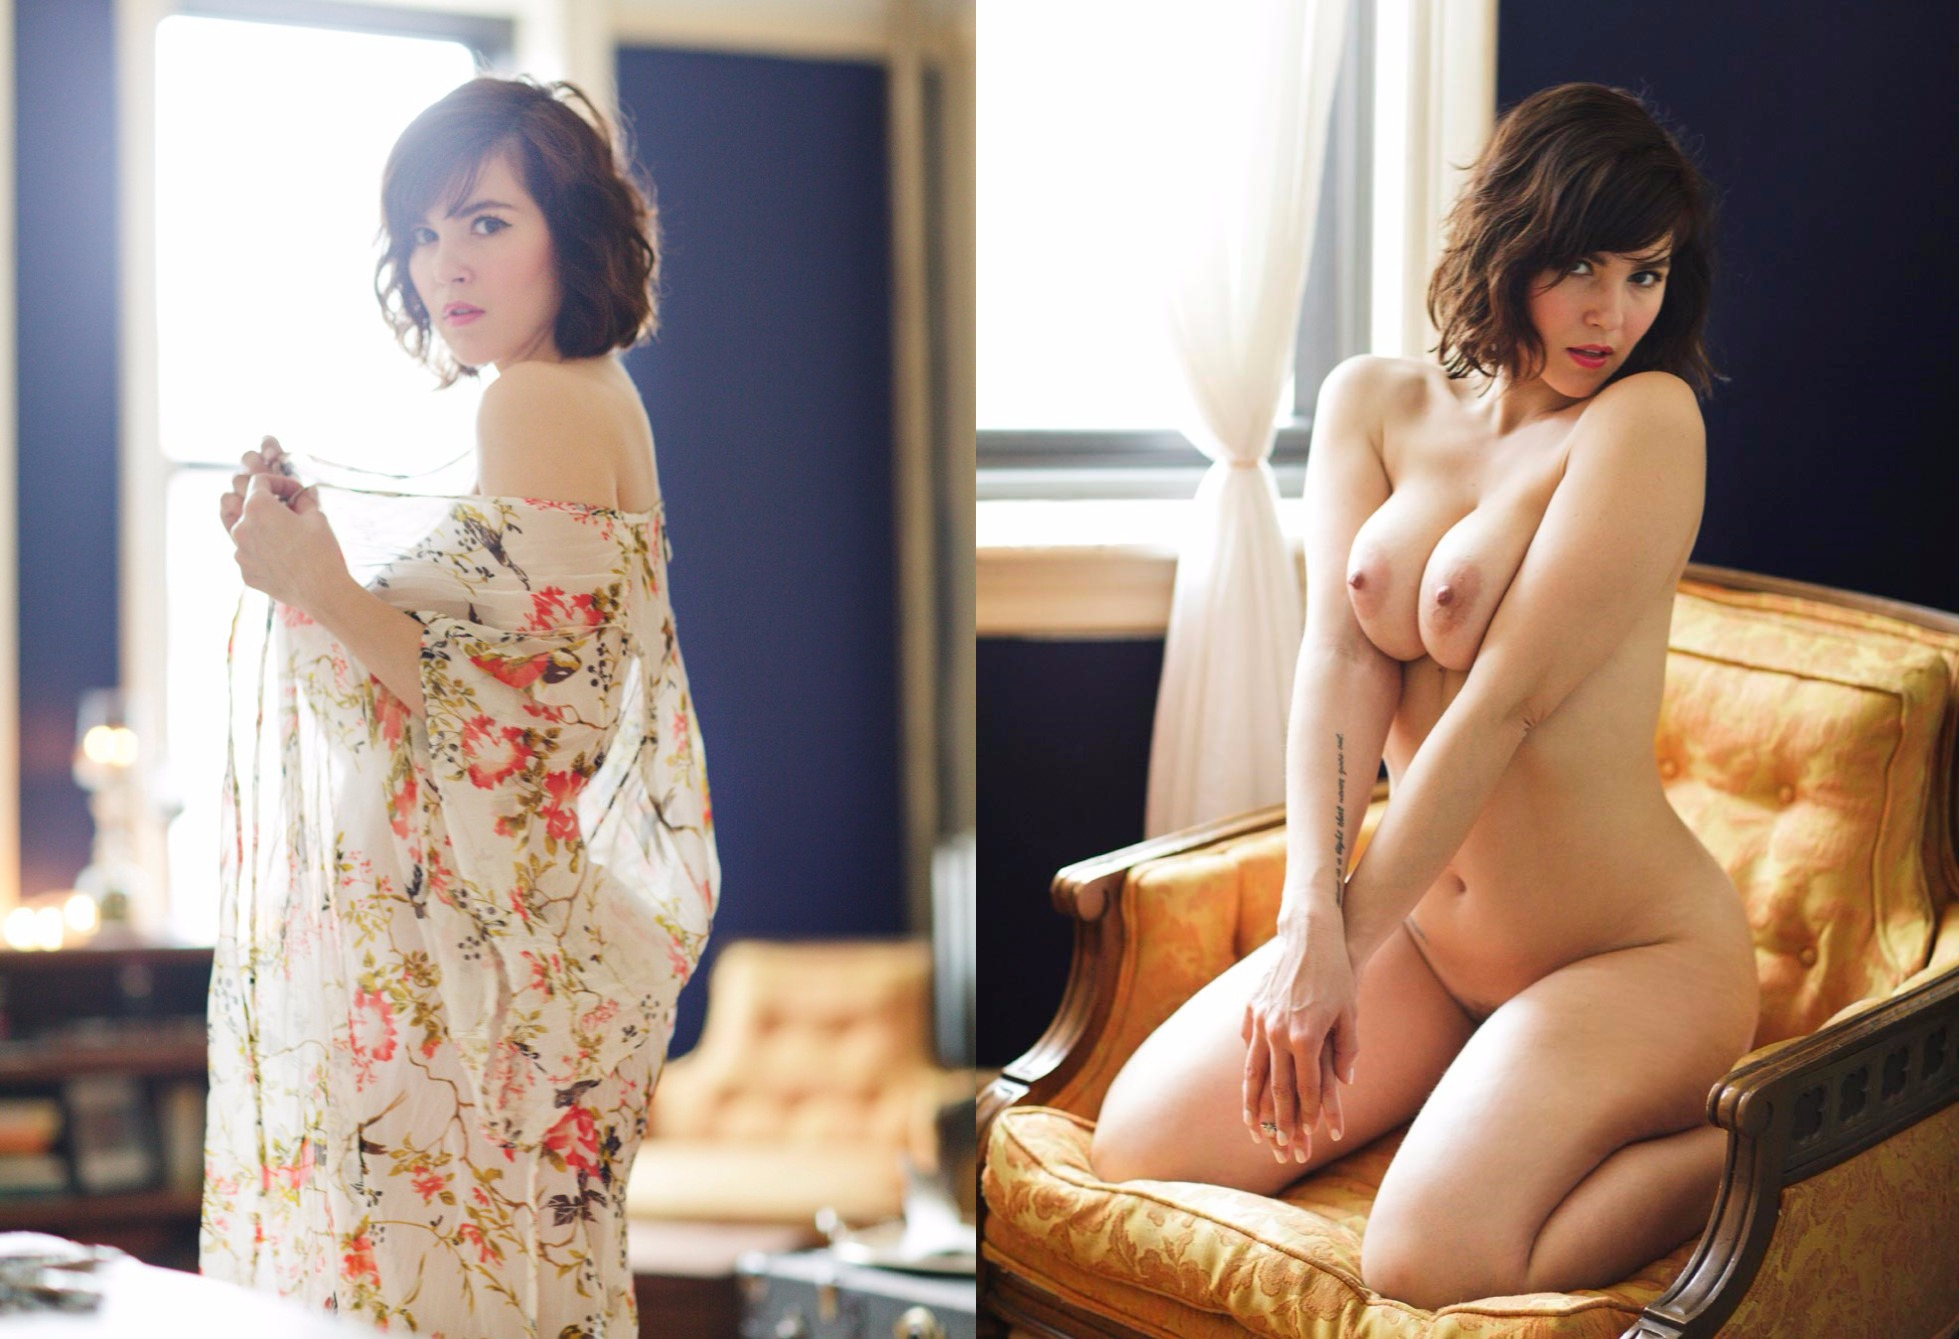 Naked cock tumblr